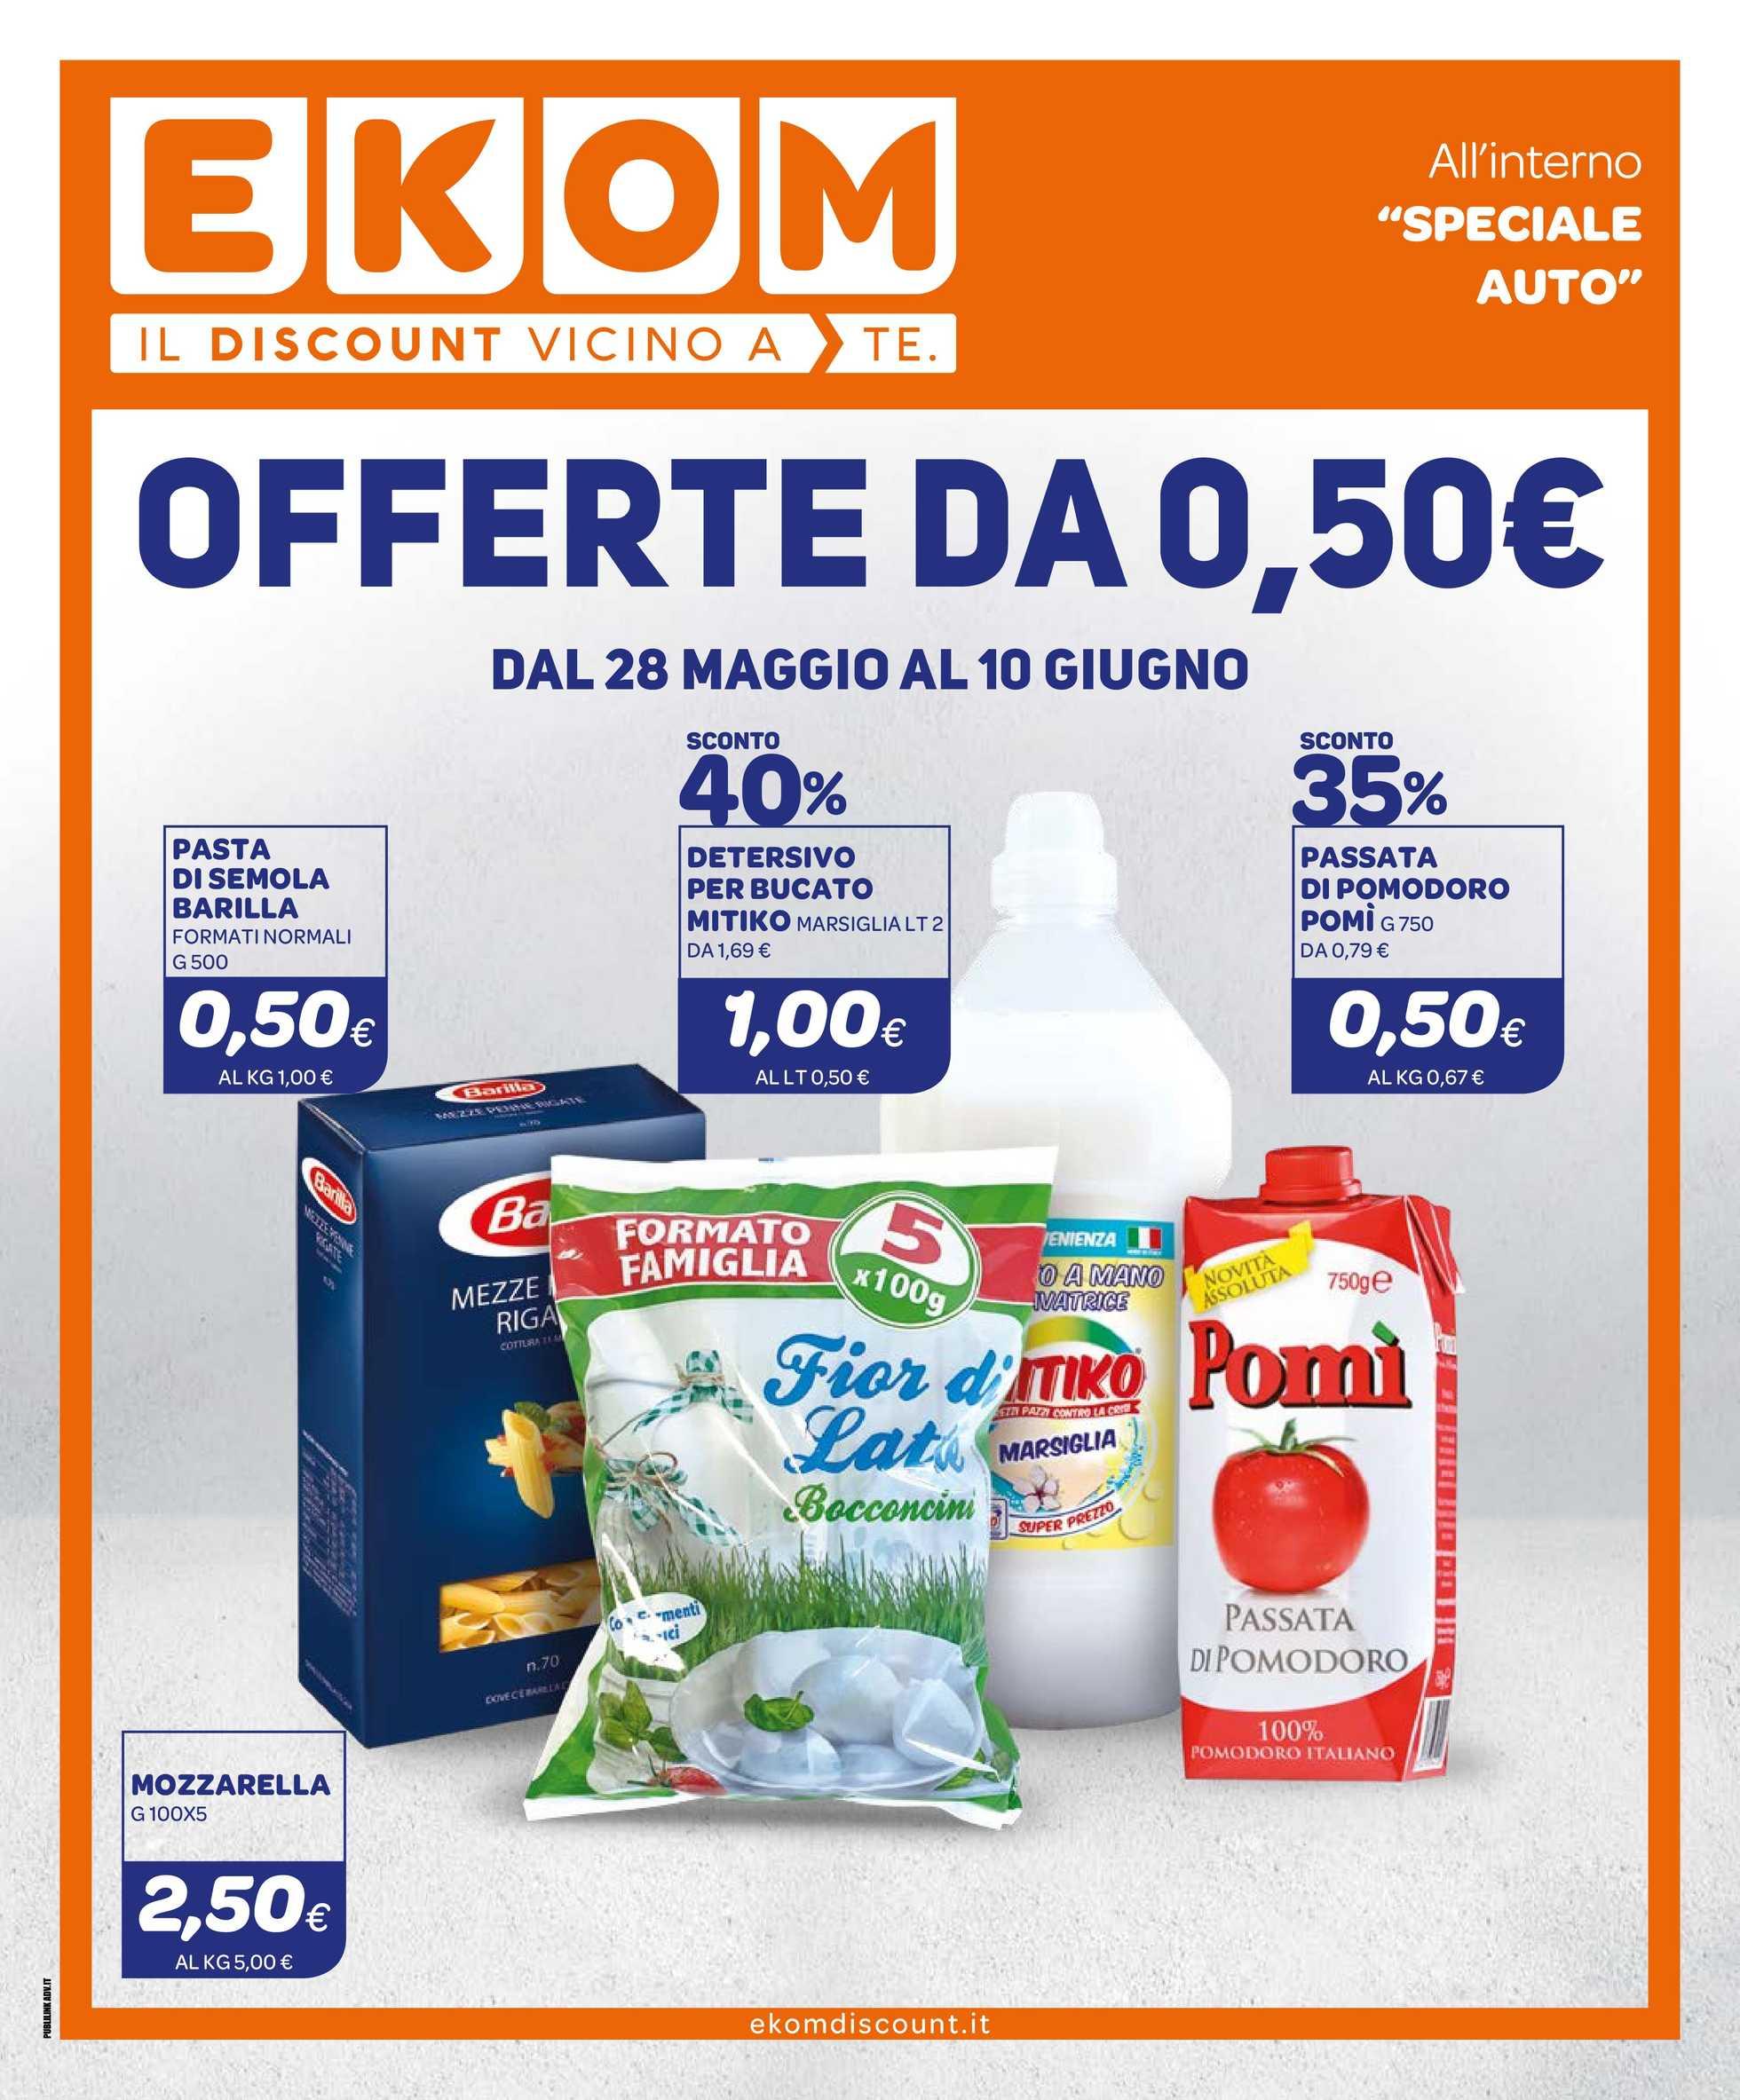 Ekom - offerte valide dal 28.05.2019 al 10.06.2019 - pagina 1.